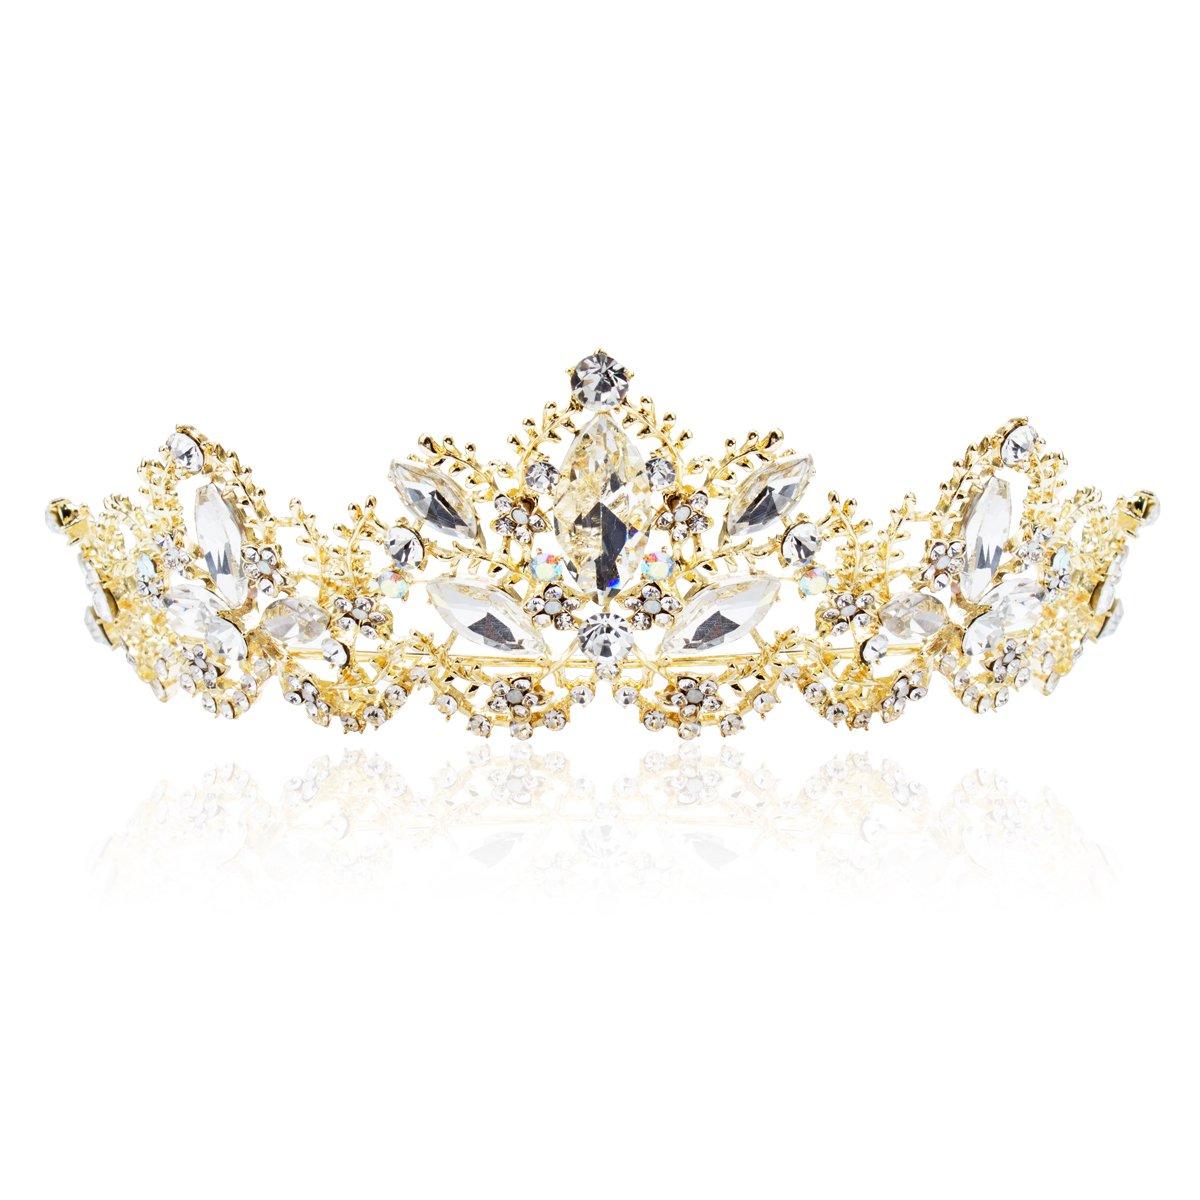 ANBALA Tiara Crowns, Rhinestone Crystal Queen Tiara Headband Wedding Pageant Crowns Princess Crown for Women